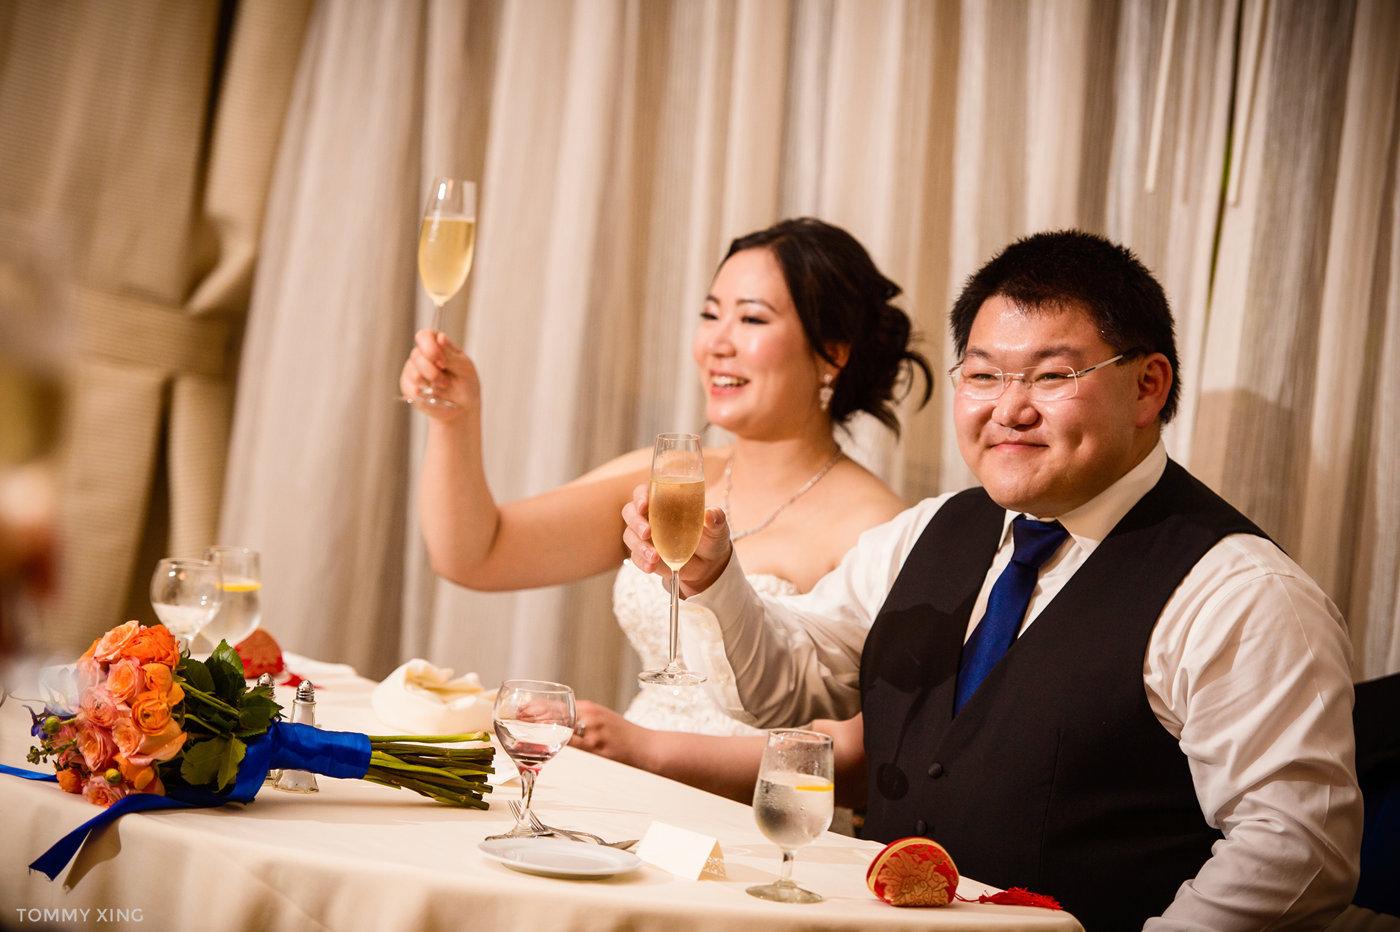 STANFORD MEMORIAL CHURCH WEDDING - Wenjie & Chengcheng - SAN FRANCISCO BAY AREA 斯坦福教堂婚礼跟拍 - 洛杉矶婚礼婚纱照摄影师 Tommy Xing Photography188.jpg